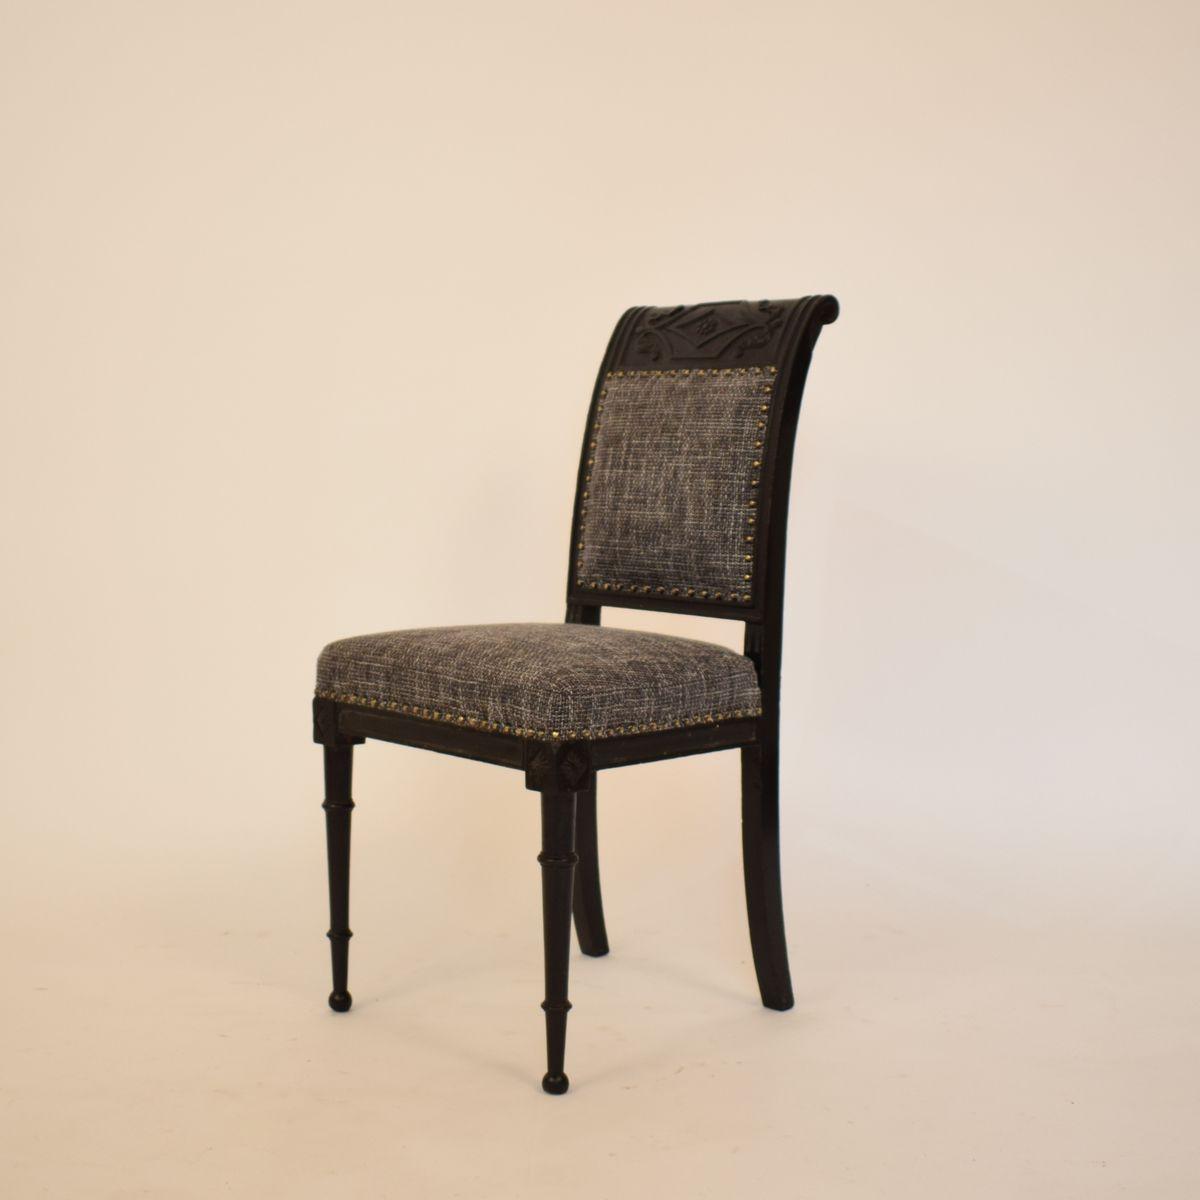 chaise d 39 appoint en eb ne fin 19 me si cle france en. Black Bedroom Furniture Sets. Home Design Ideas